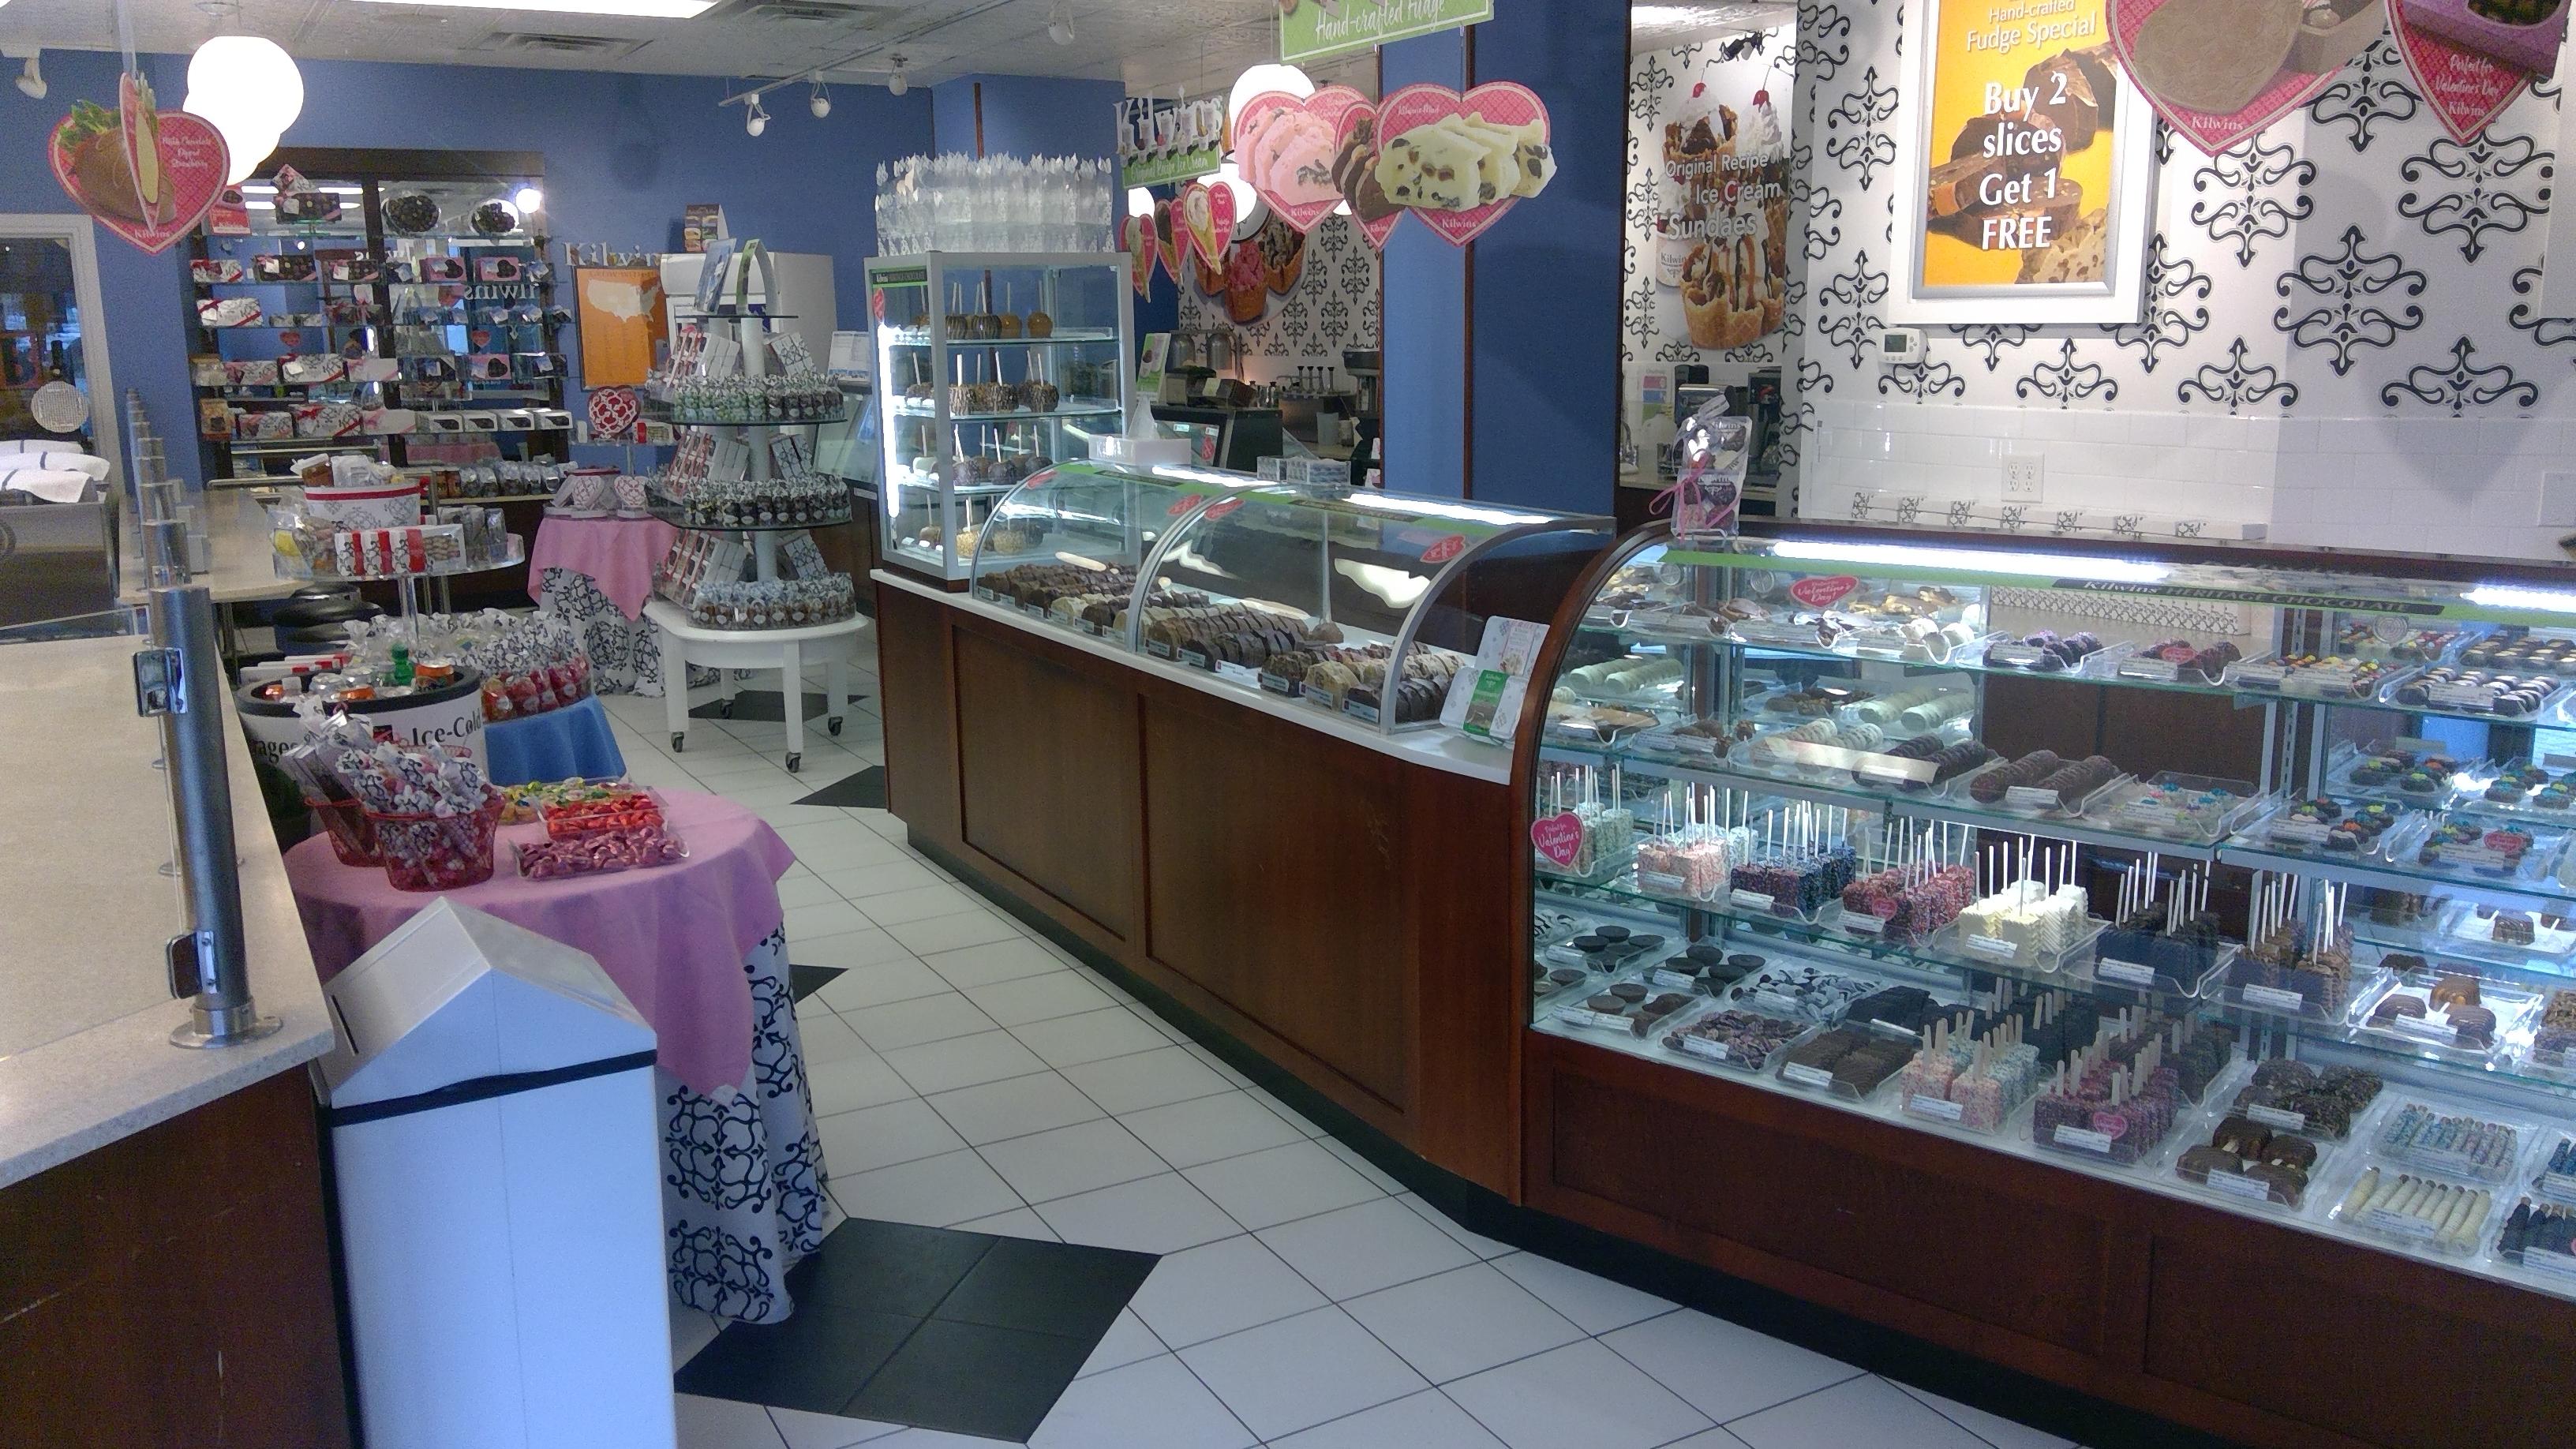 Interior picture of the Grand Rapids store